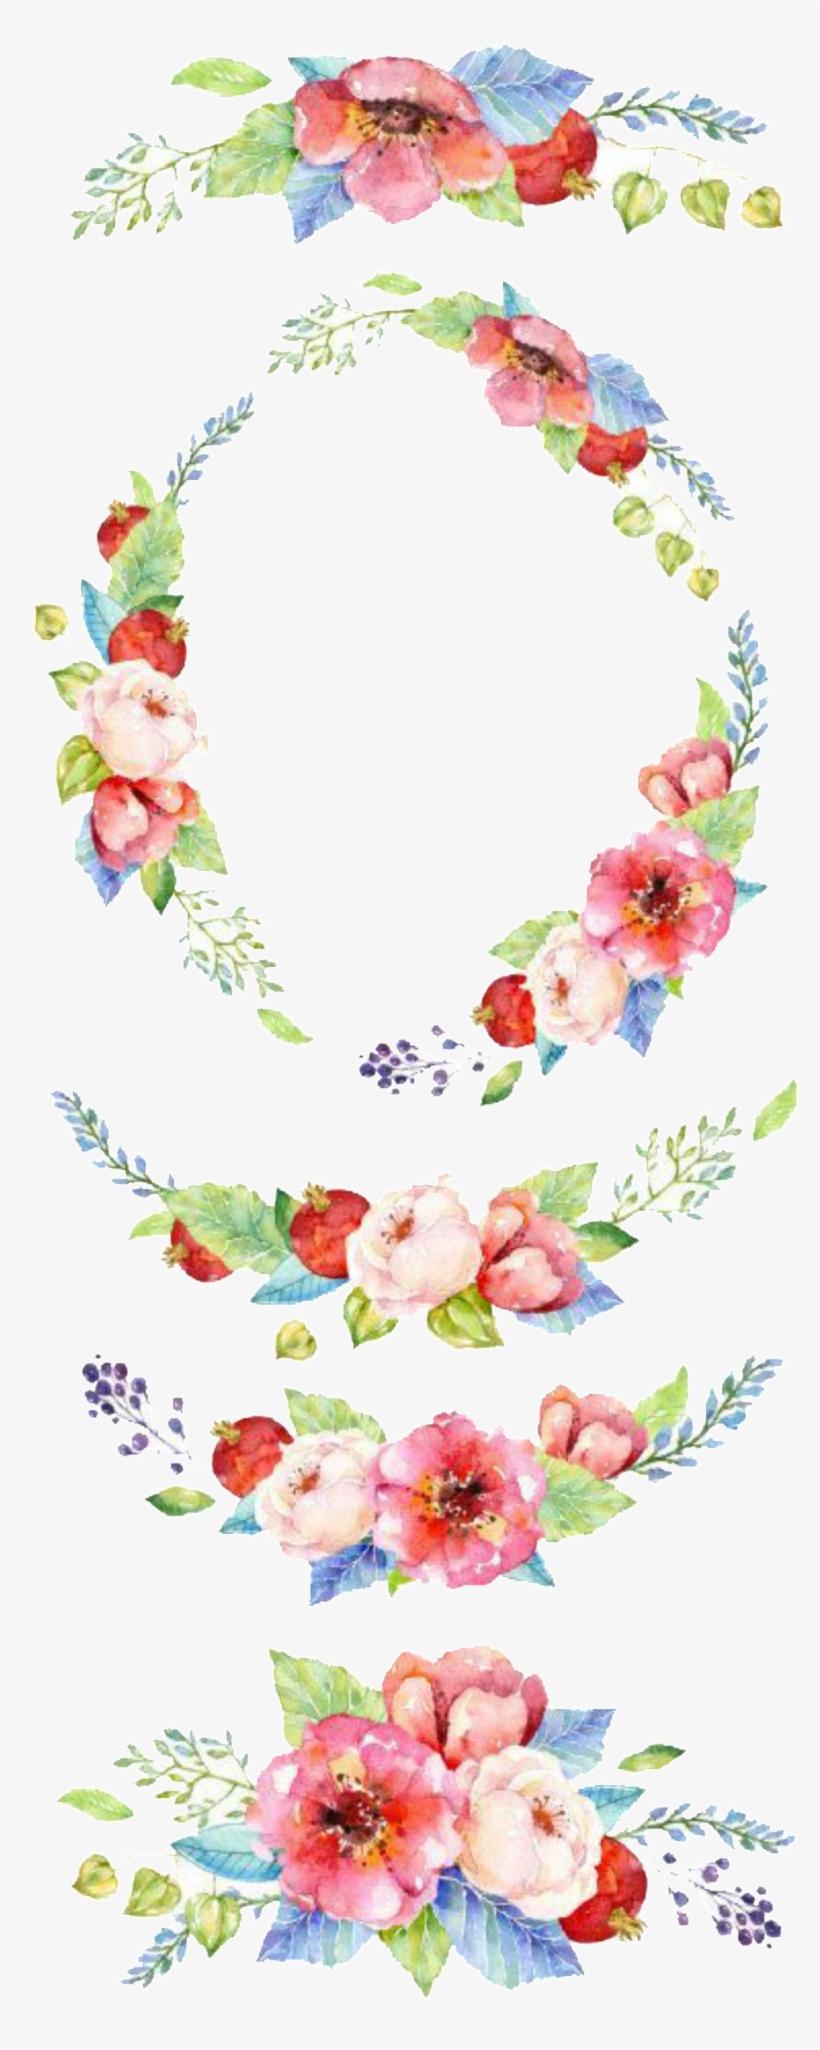 Fresh Watercolor Flowers Hand Drawn Wreath Decorative - Flowers Clip Art Invitations, transparent png #145293